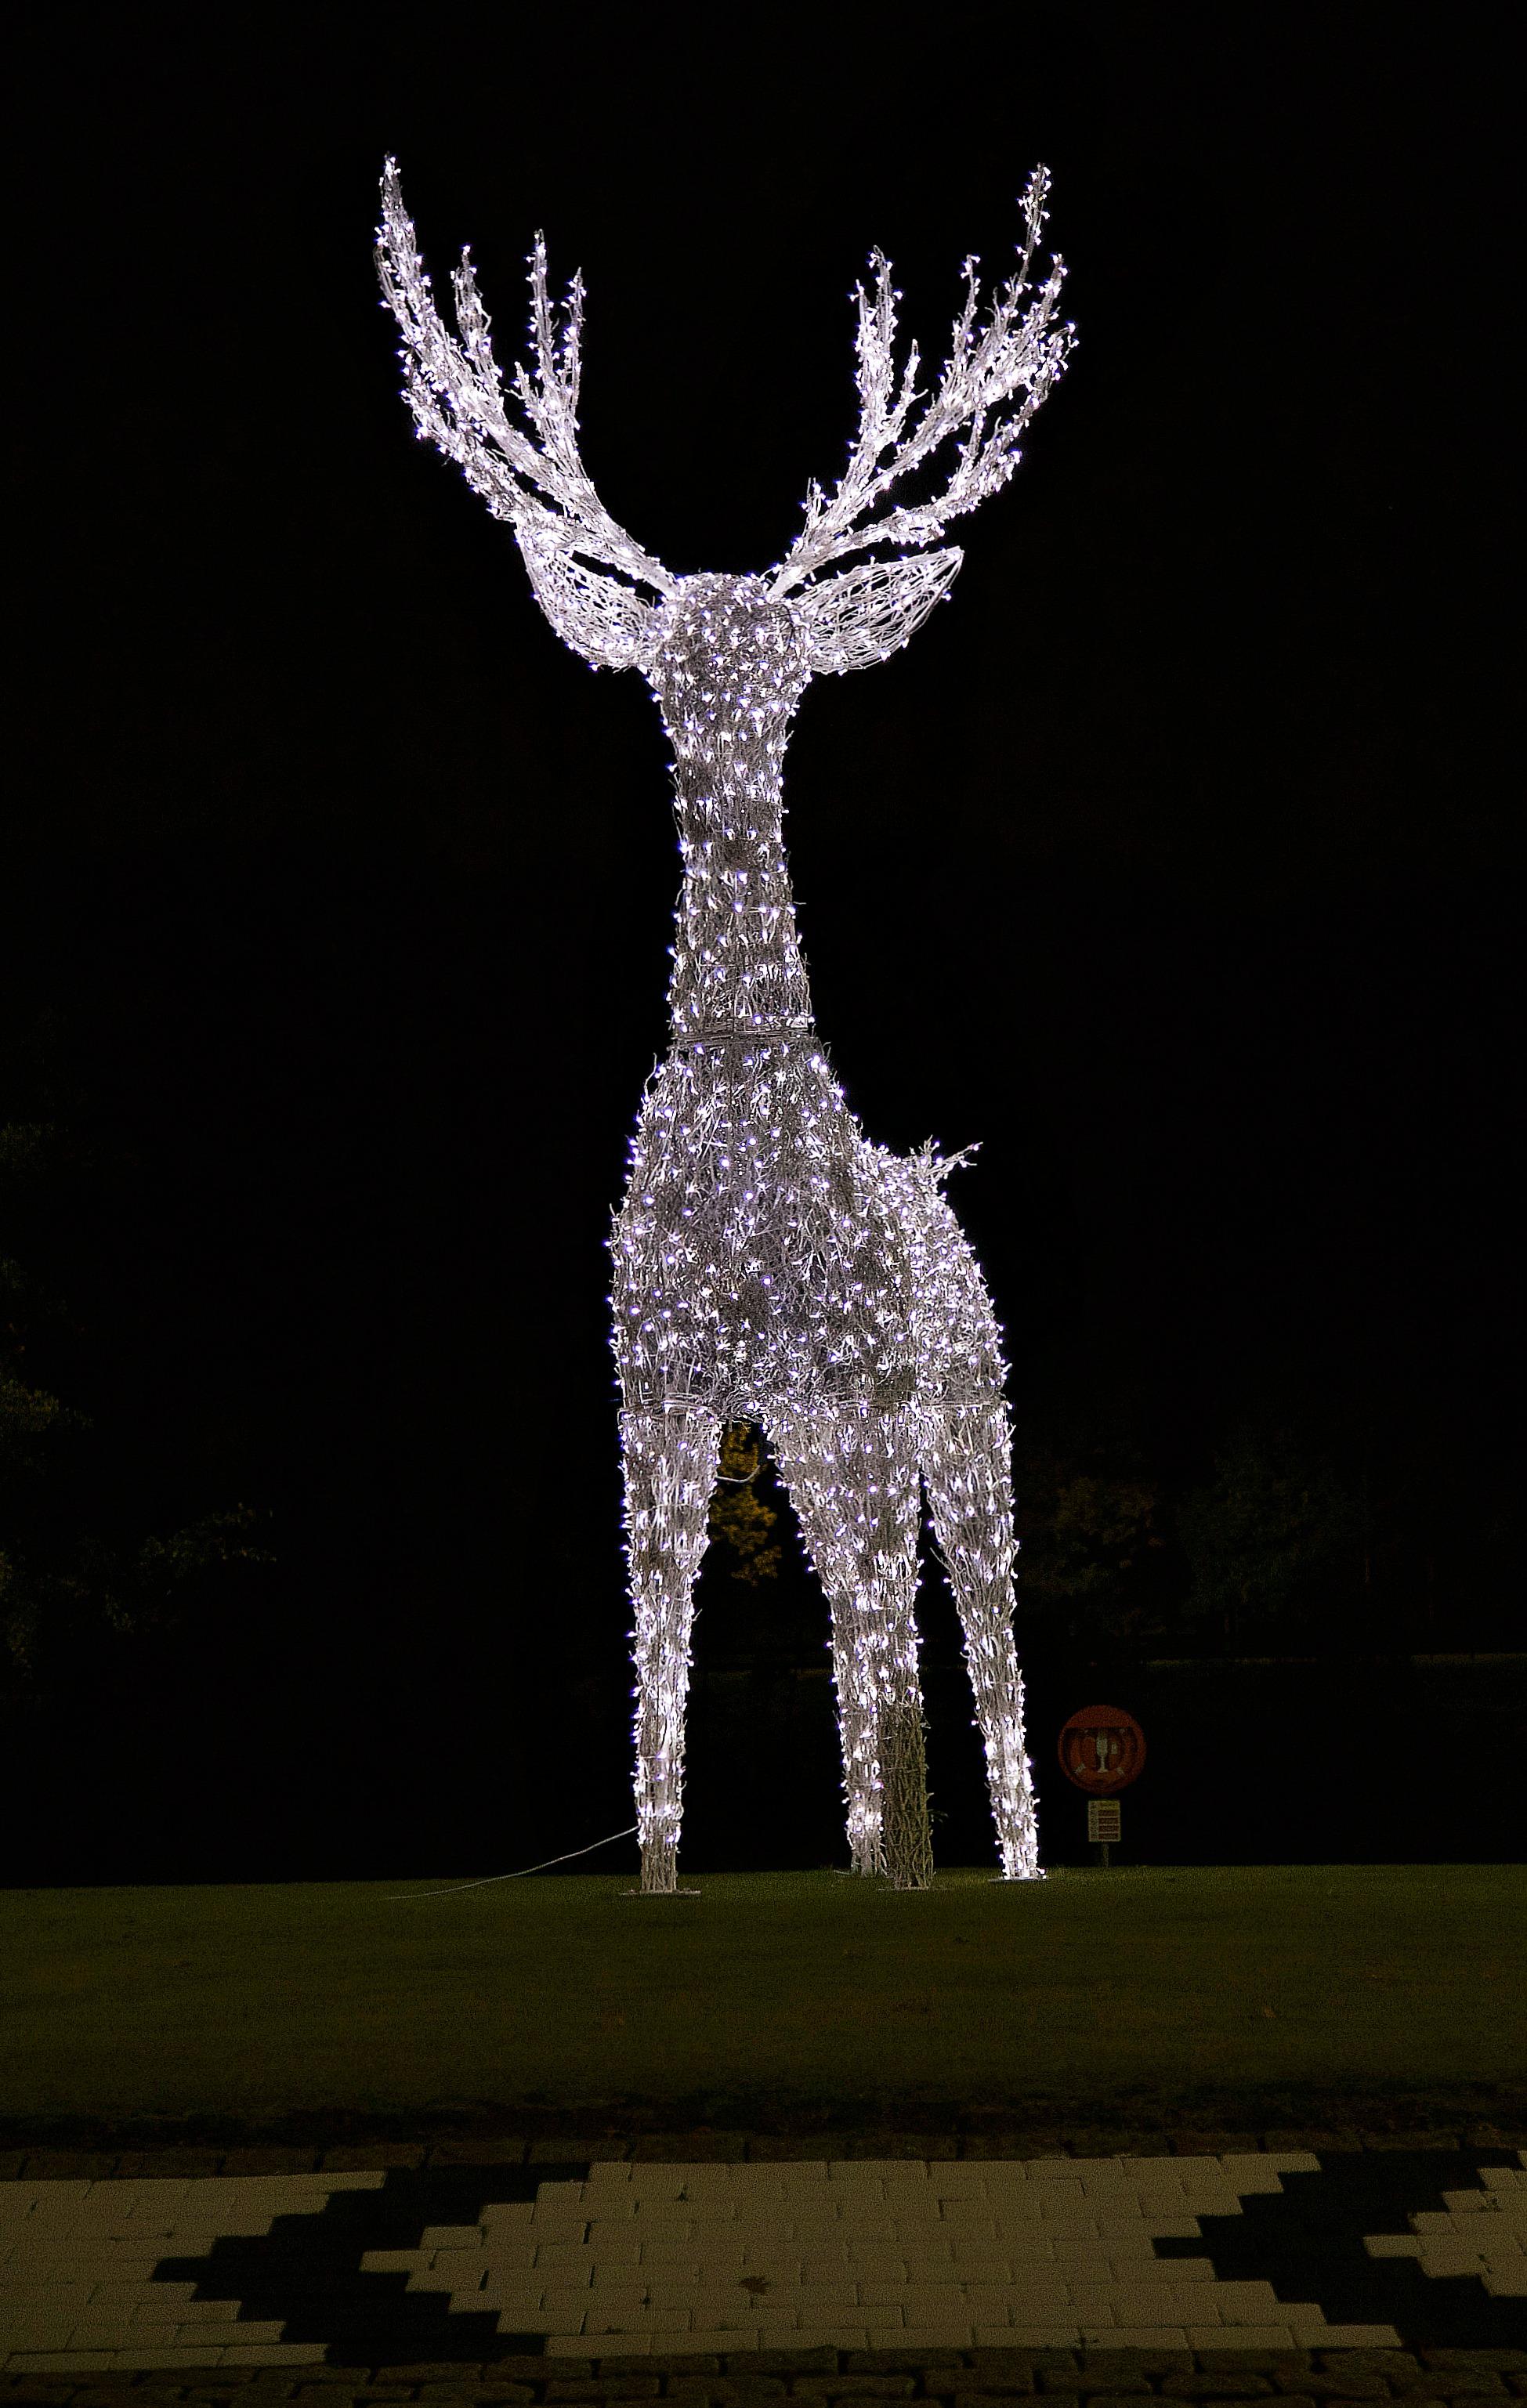 Giant Light-Up Reindeer